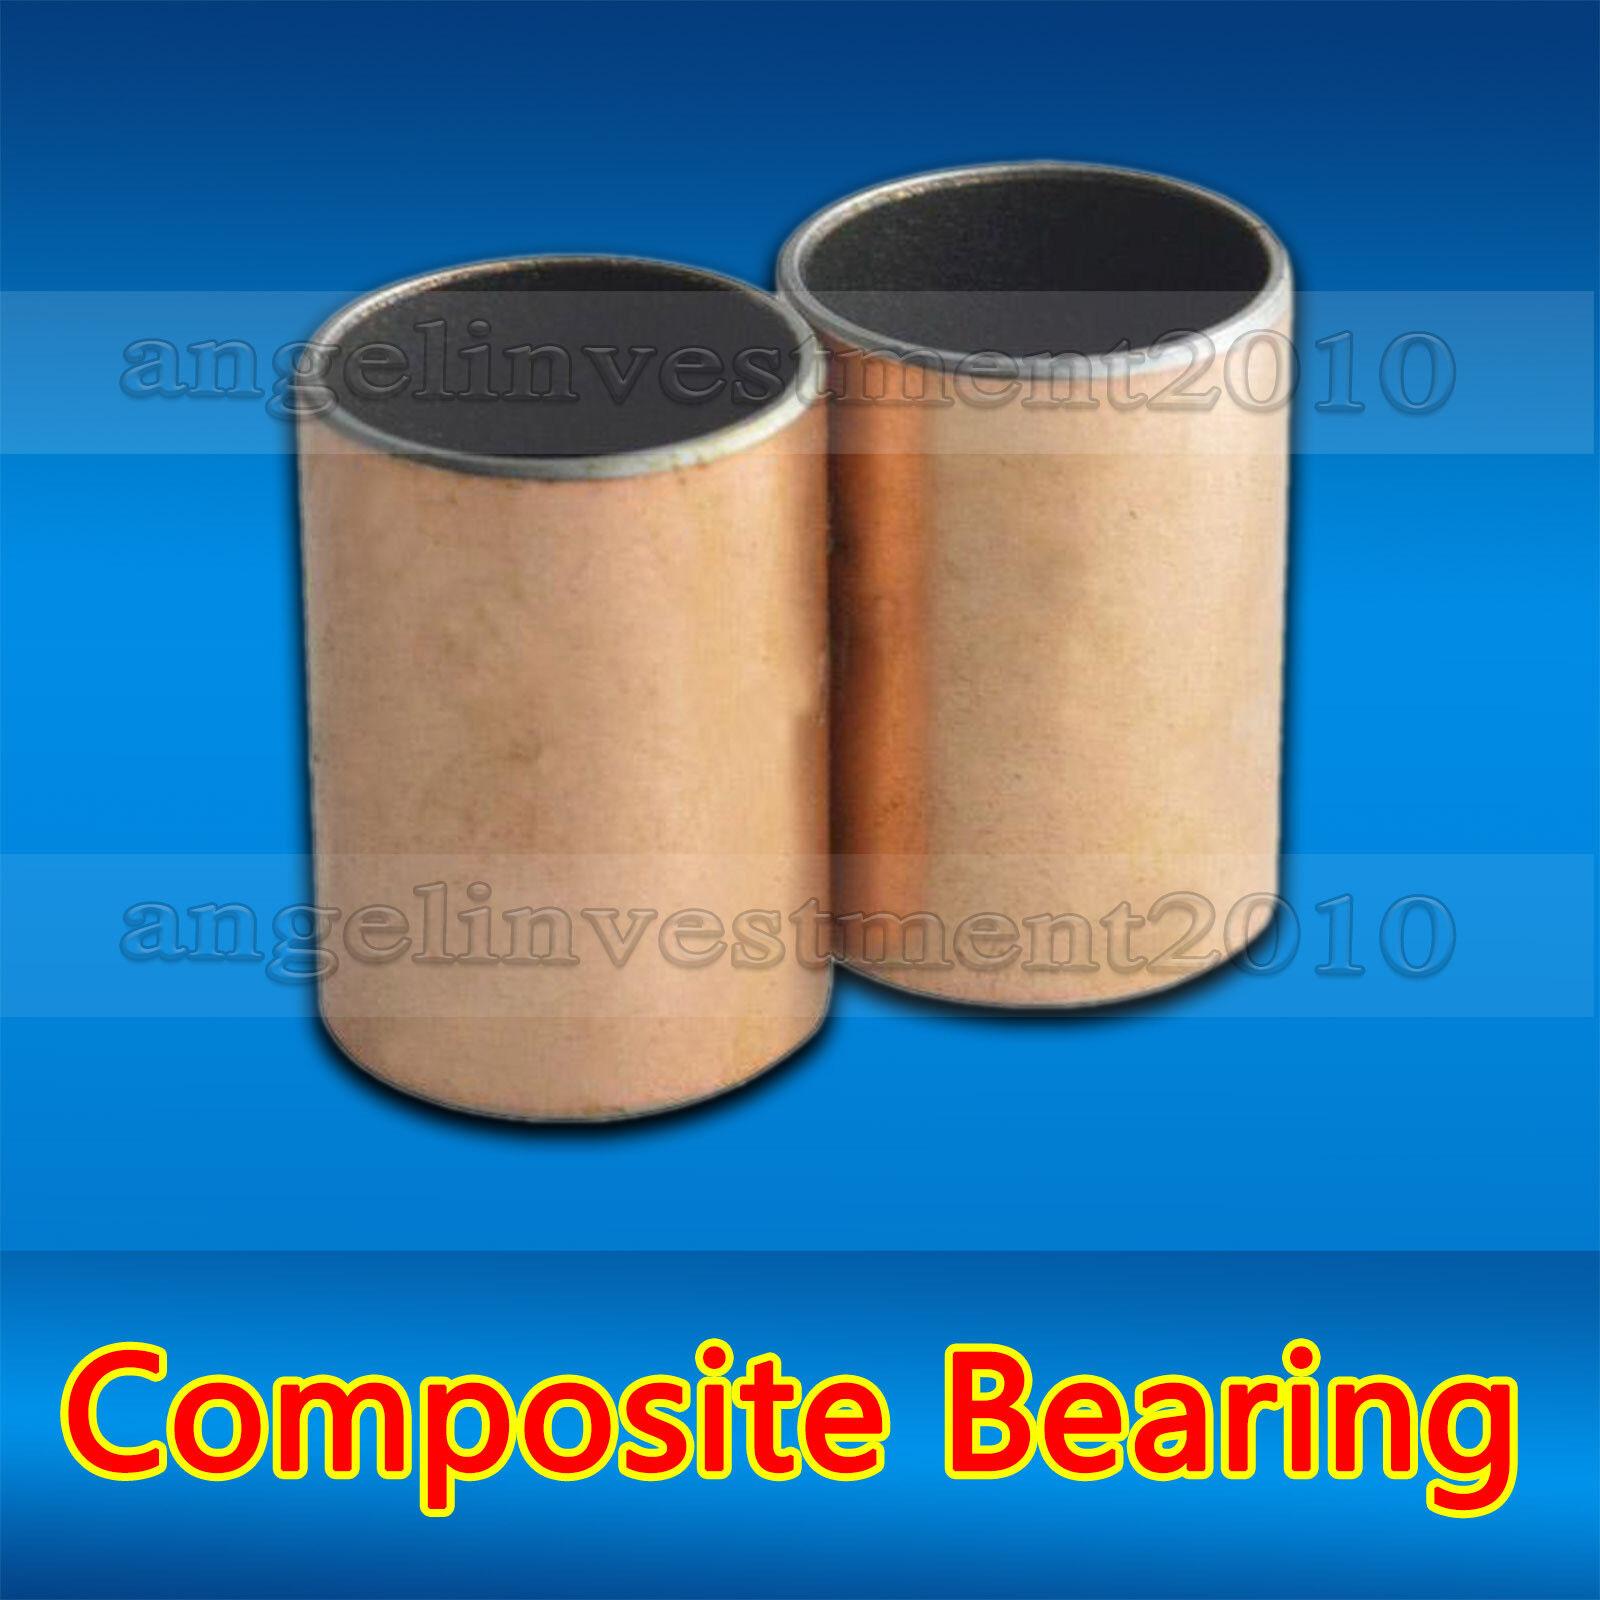 25mm 20pcs SF-1 self lubricating composite bearing bushing sleeve 14mm 16mm